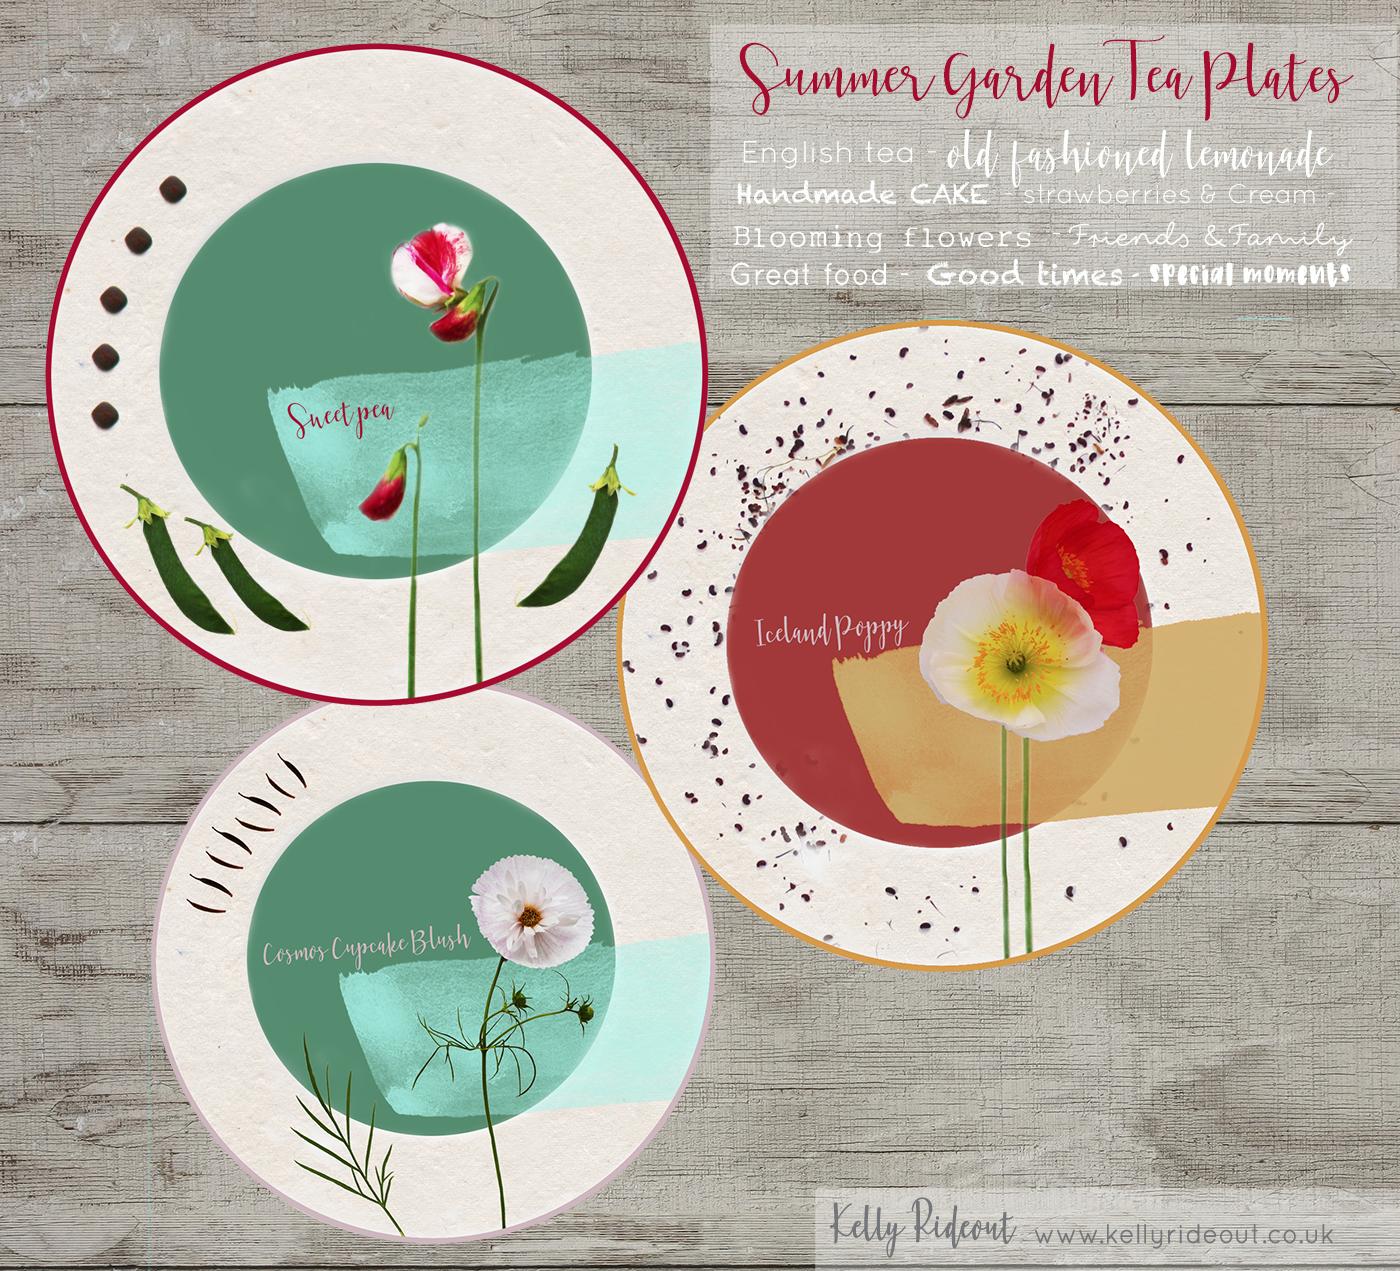 Summer Garden Tea Plates